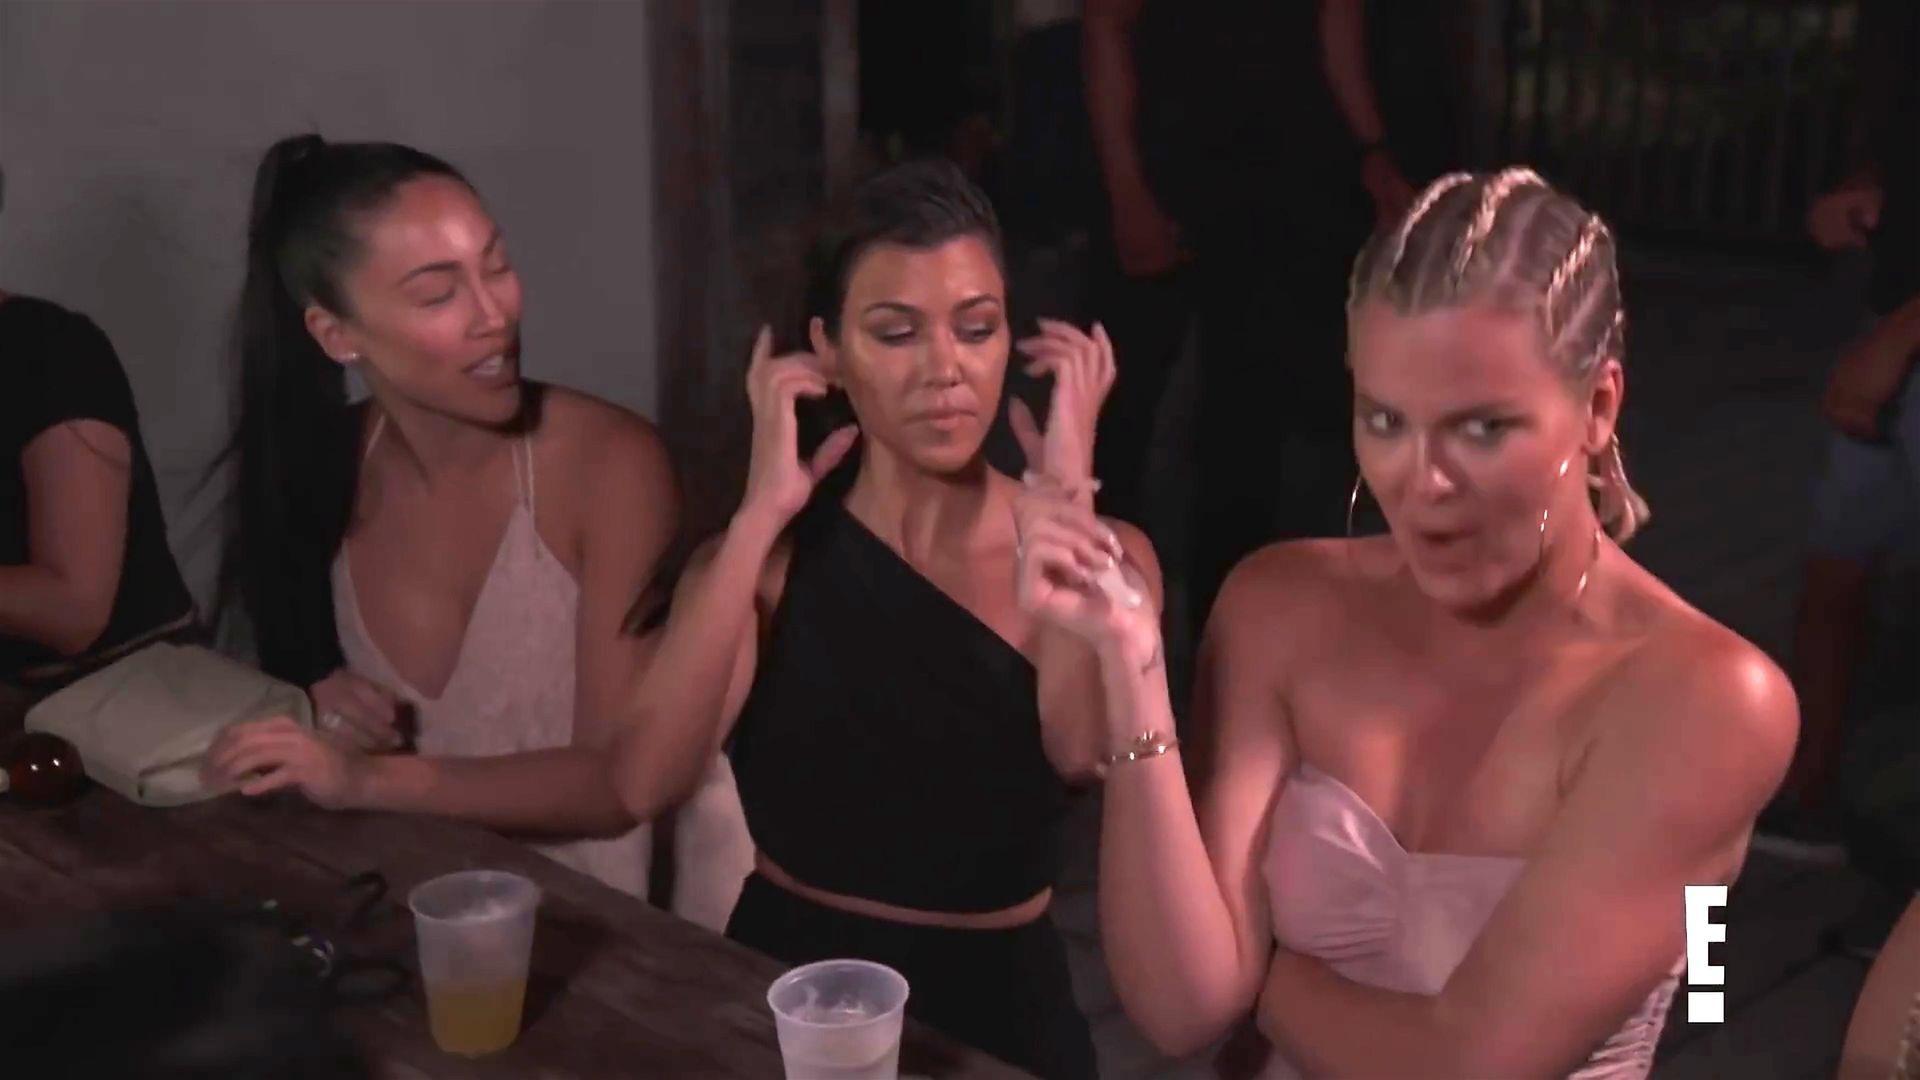 Khloé Kardashian Gets A Little Cold Without A Bra 0003